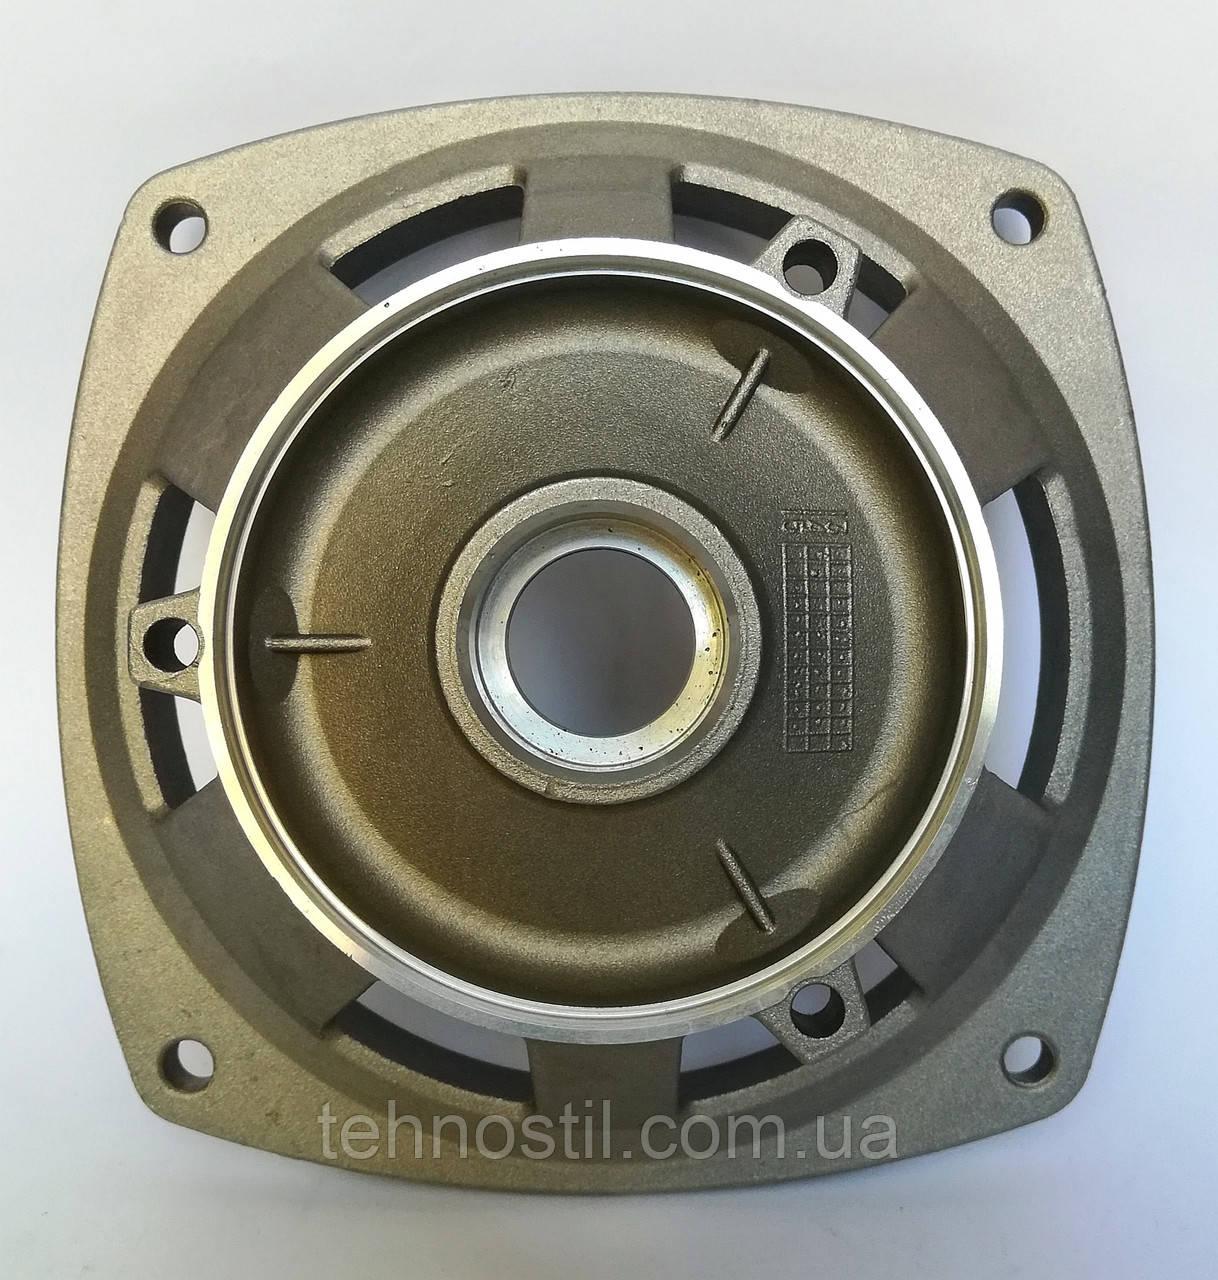 Крышка корпуса мотора (фланец) Pedrollo JSW 1C-B -A